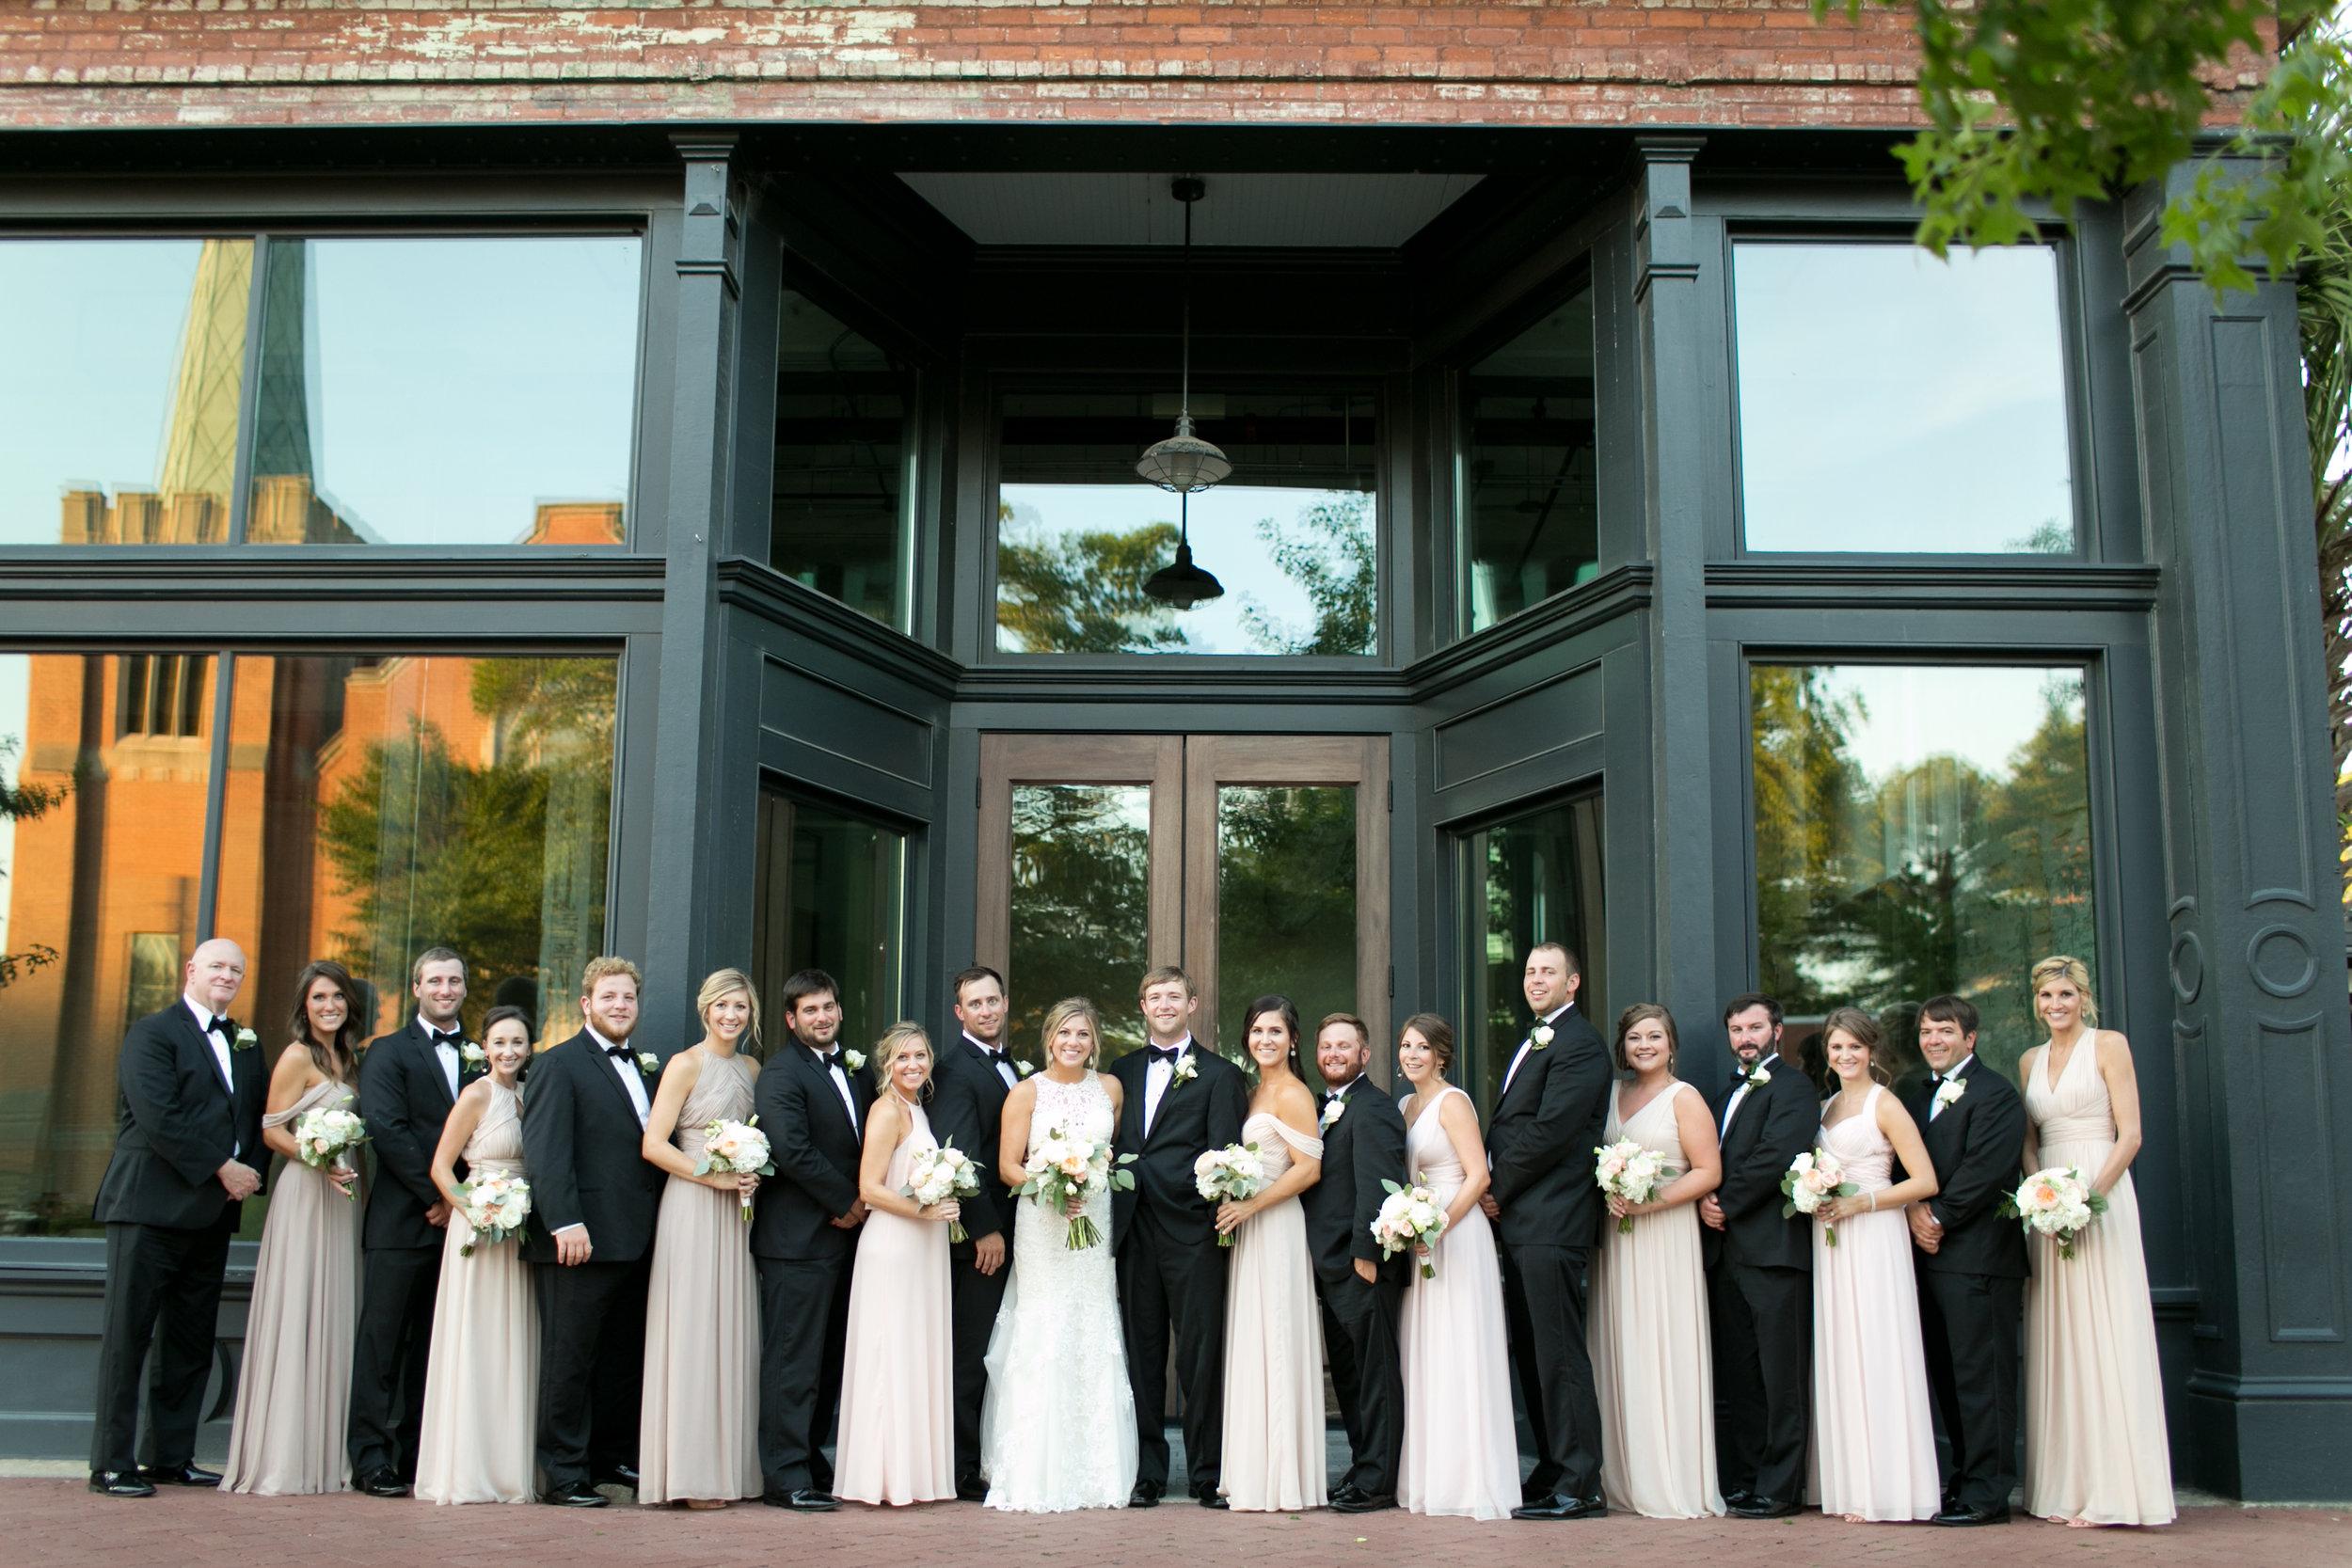 701_whaley_wedding_35.jpg